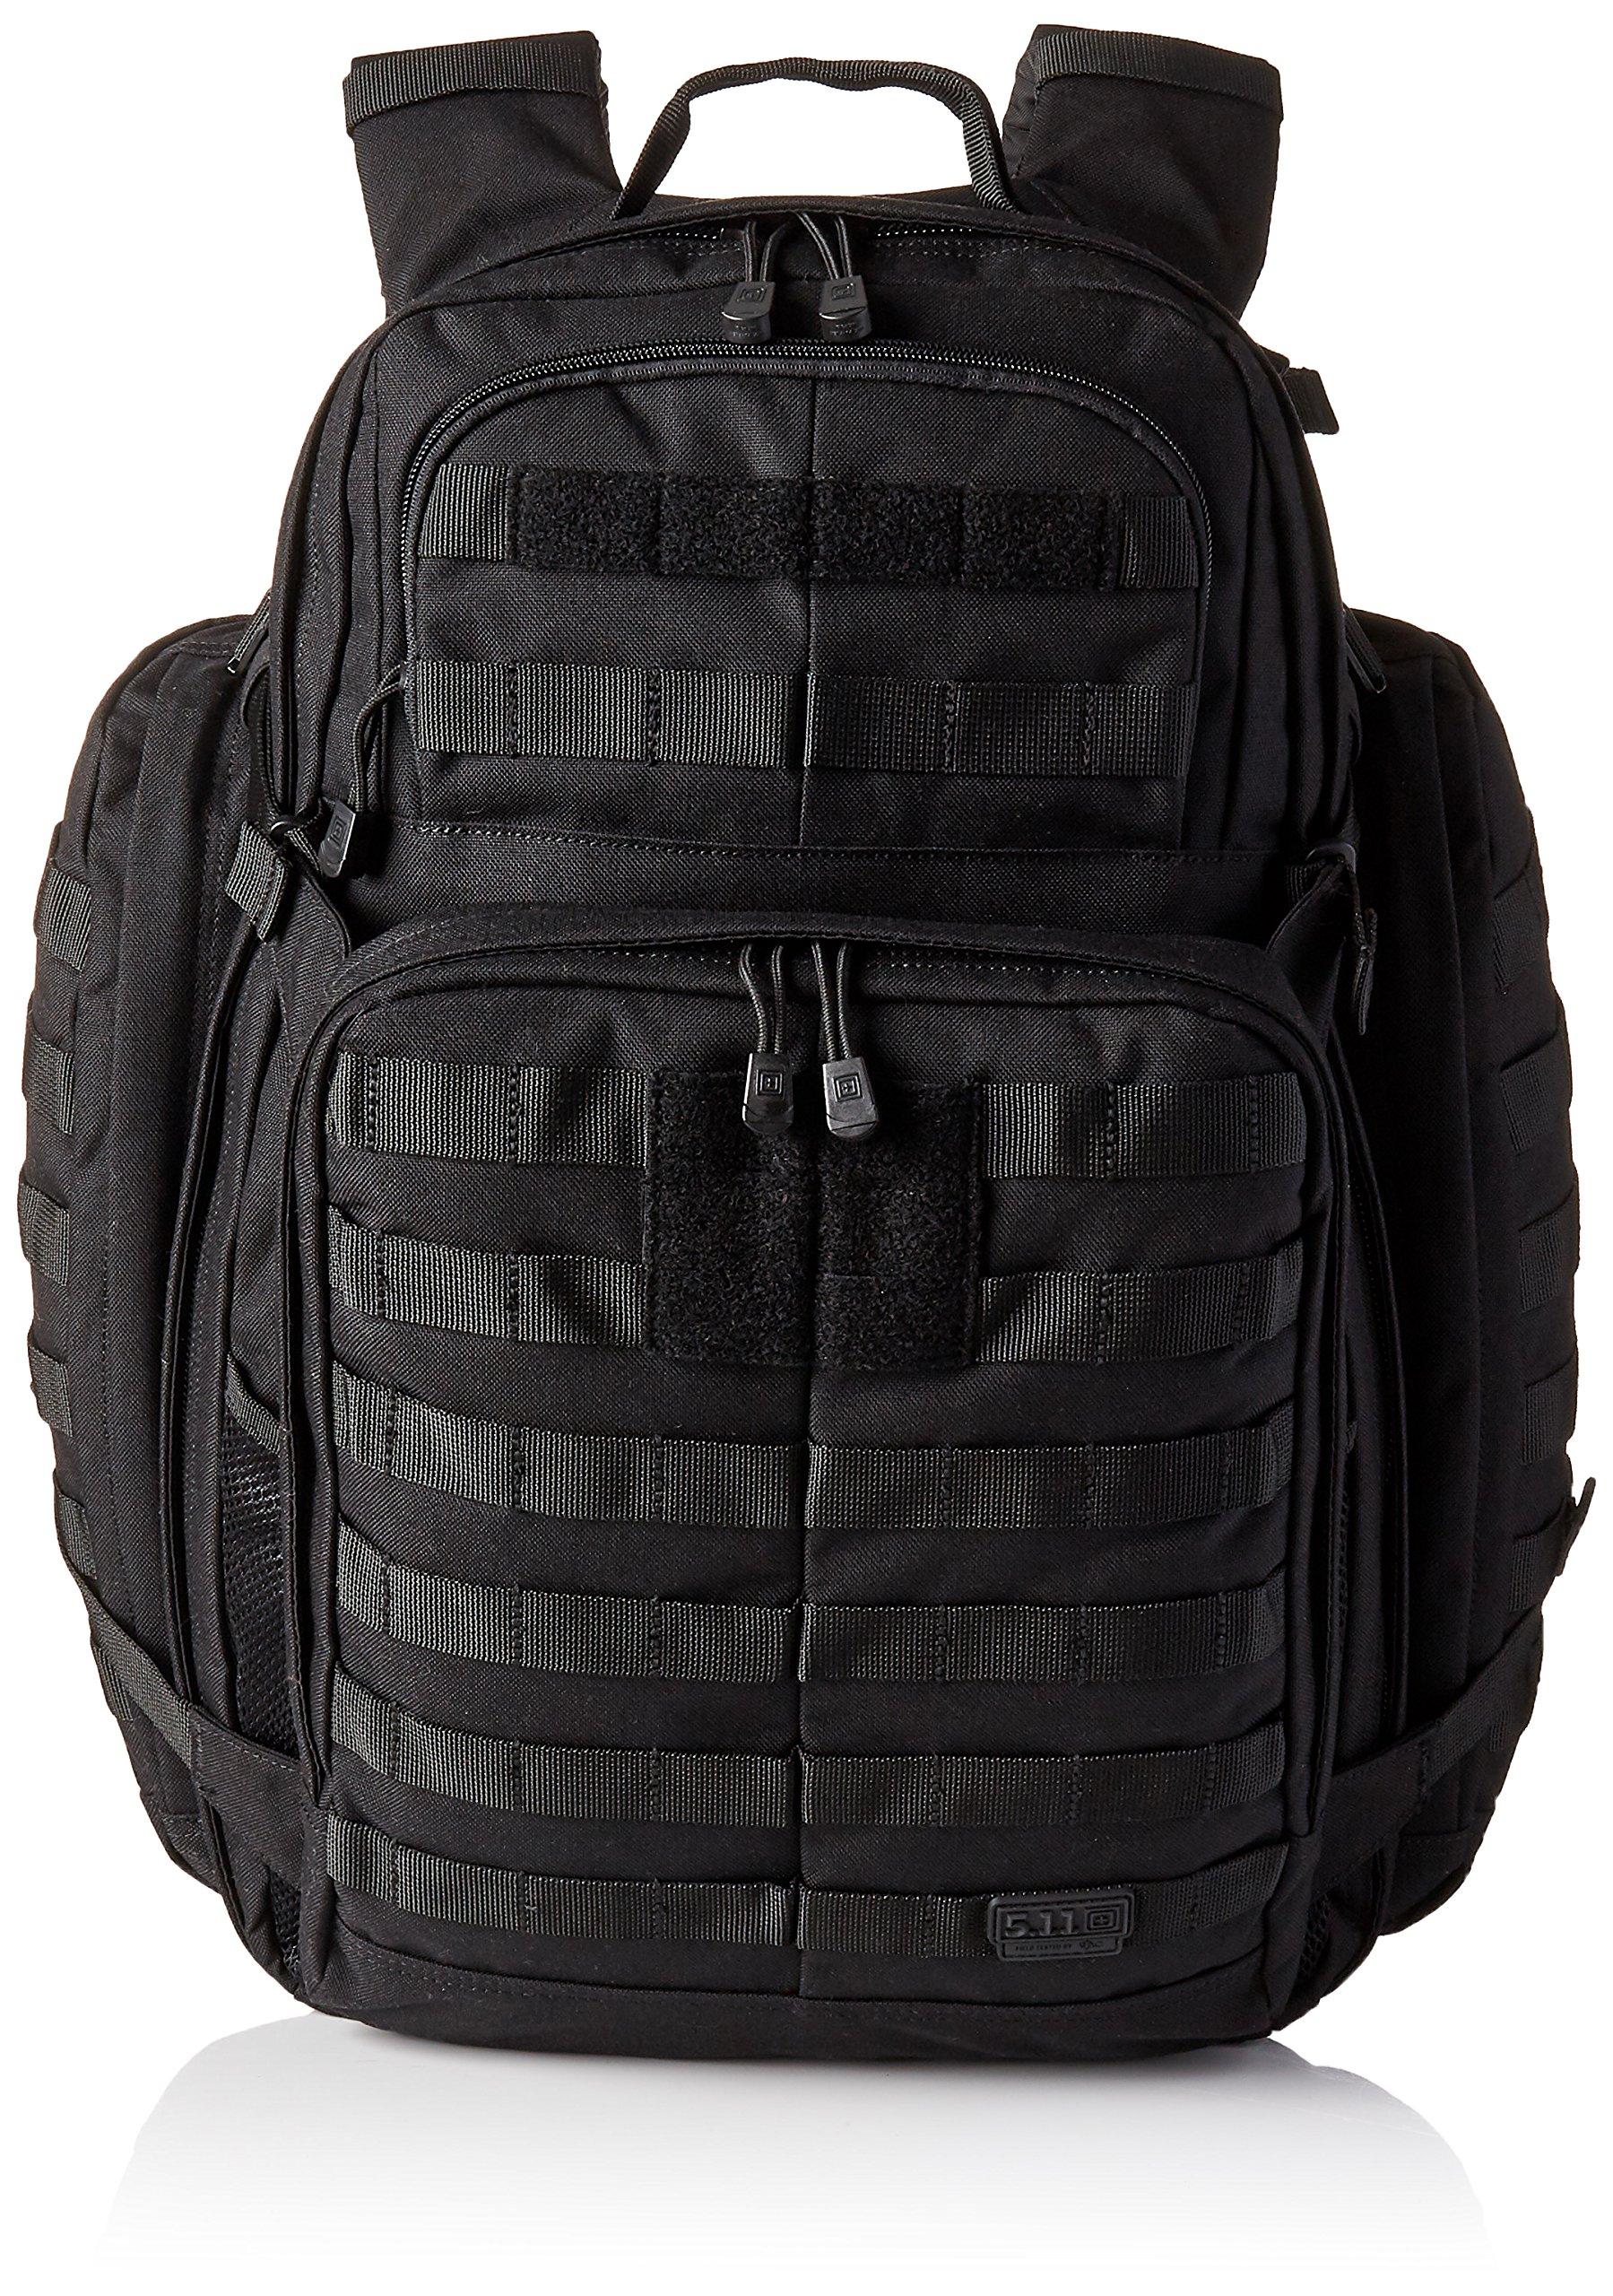 5.11 Tactical Rush 72 Backpack – Mochila Rush, Adulto, Talla única